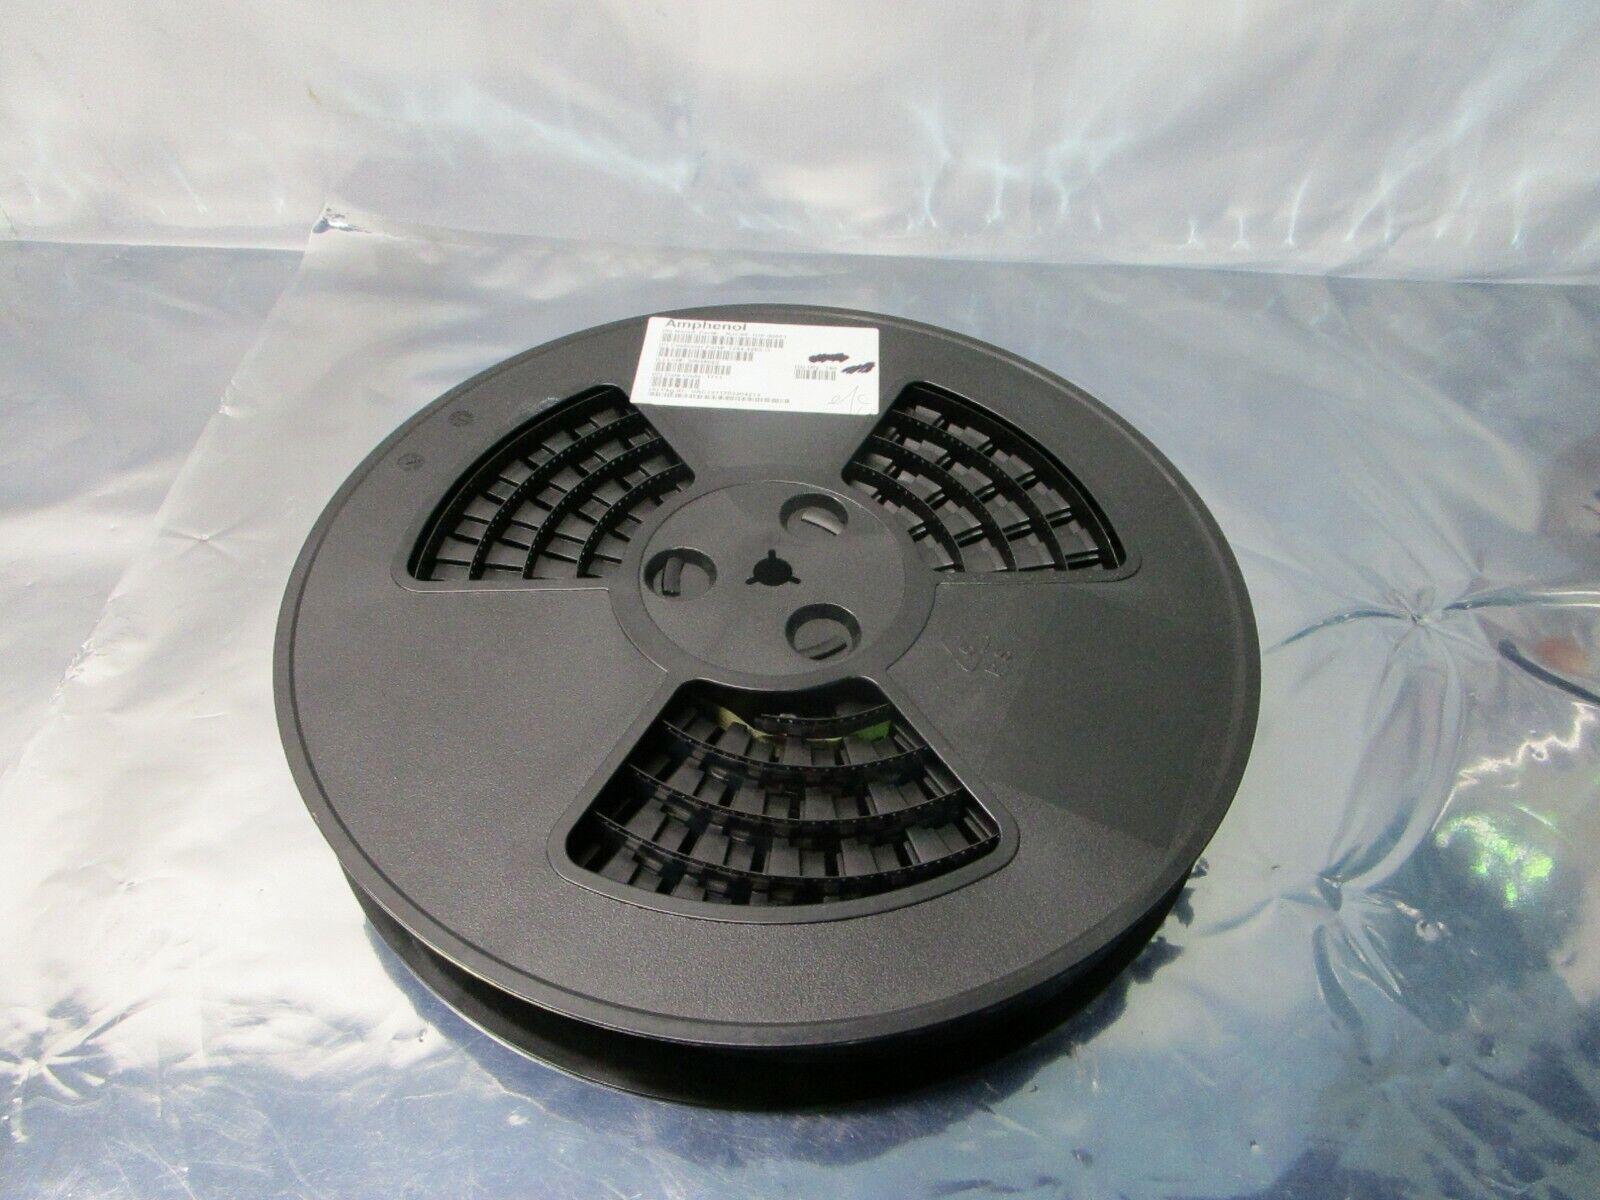 1 Lot of 150 Amphenol ICC RJCSE-1RA-0001, 102303